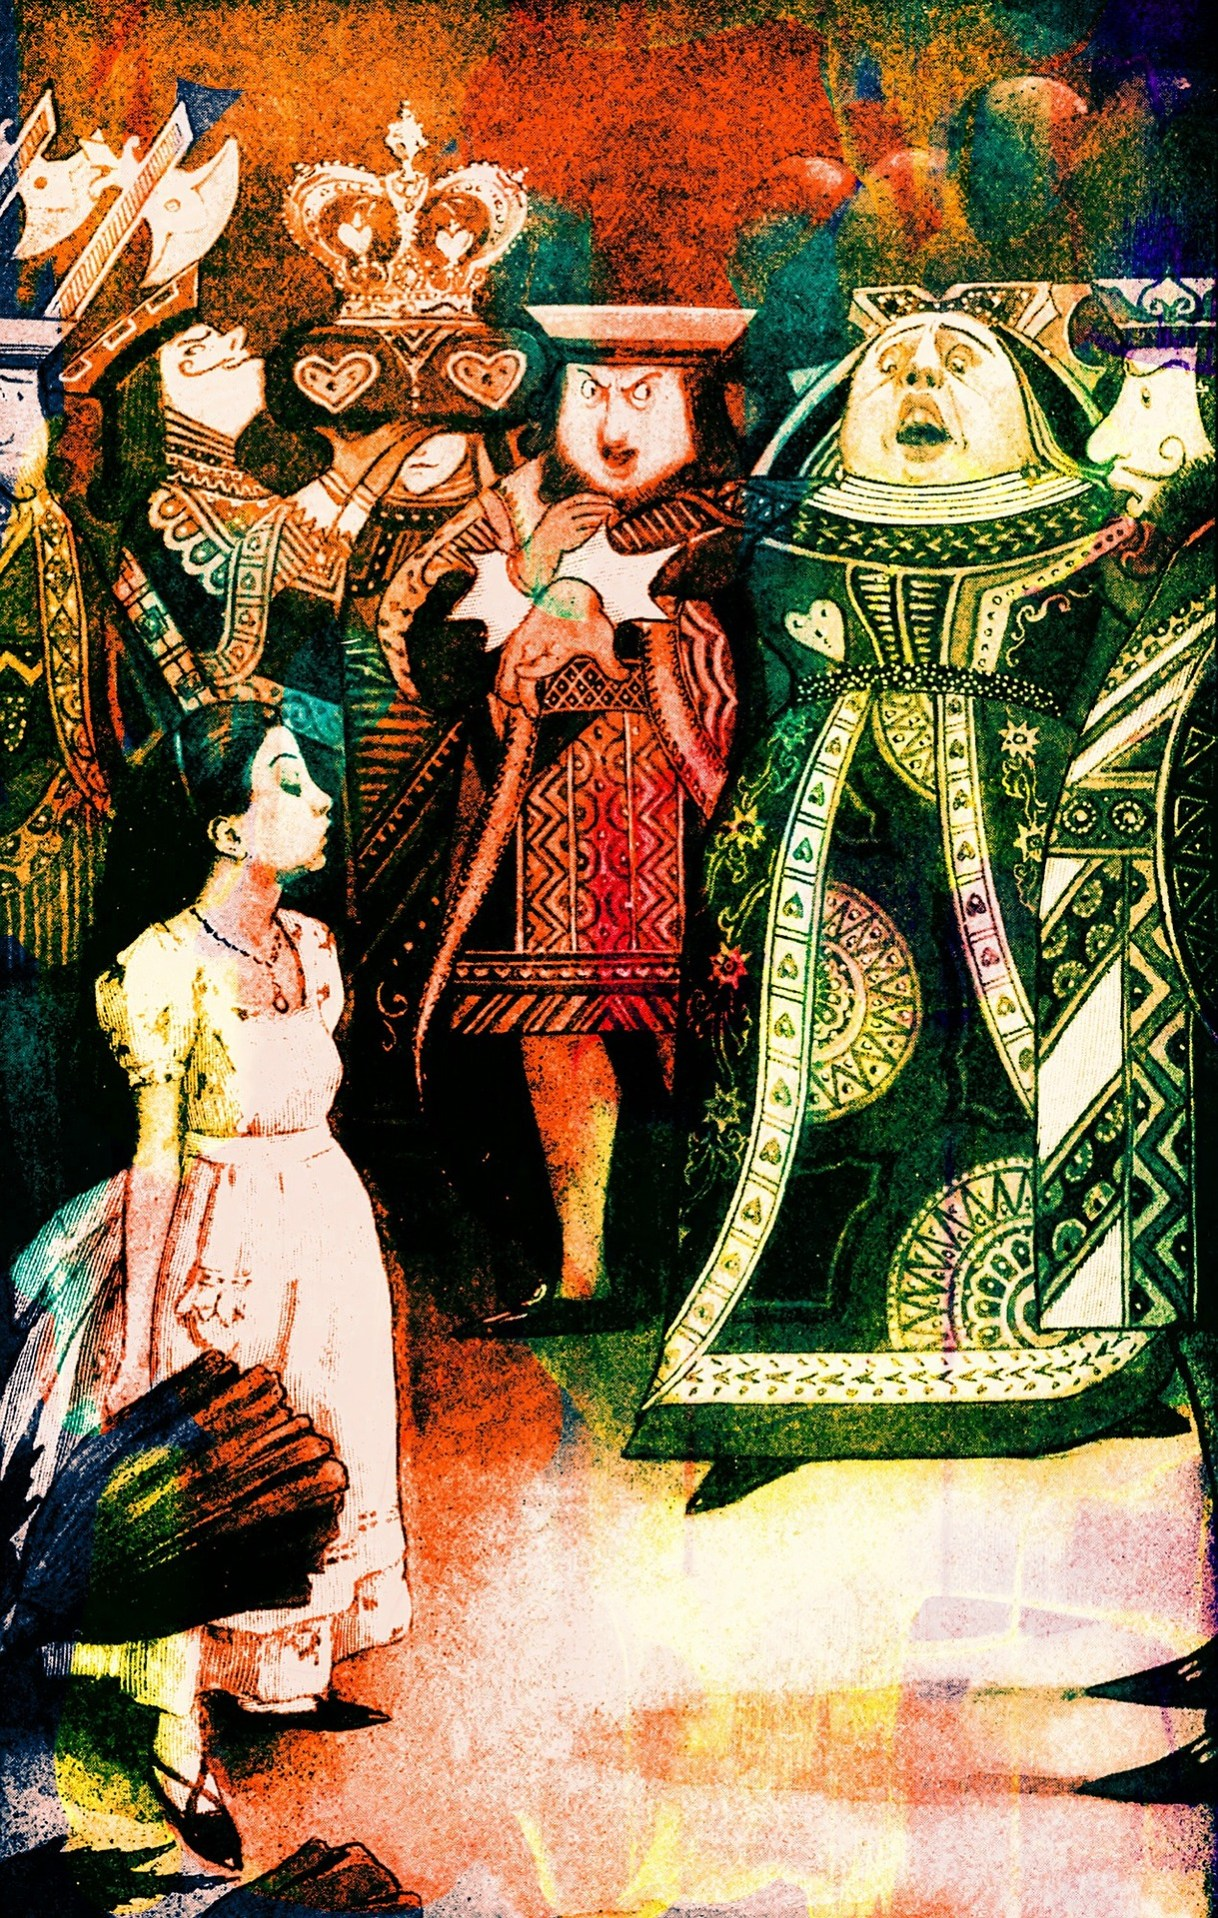 Alice in Wonderland Vintage Image - Christina Dodd Interview